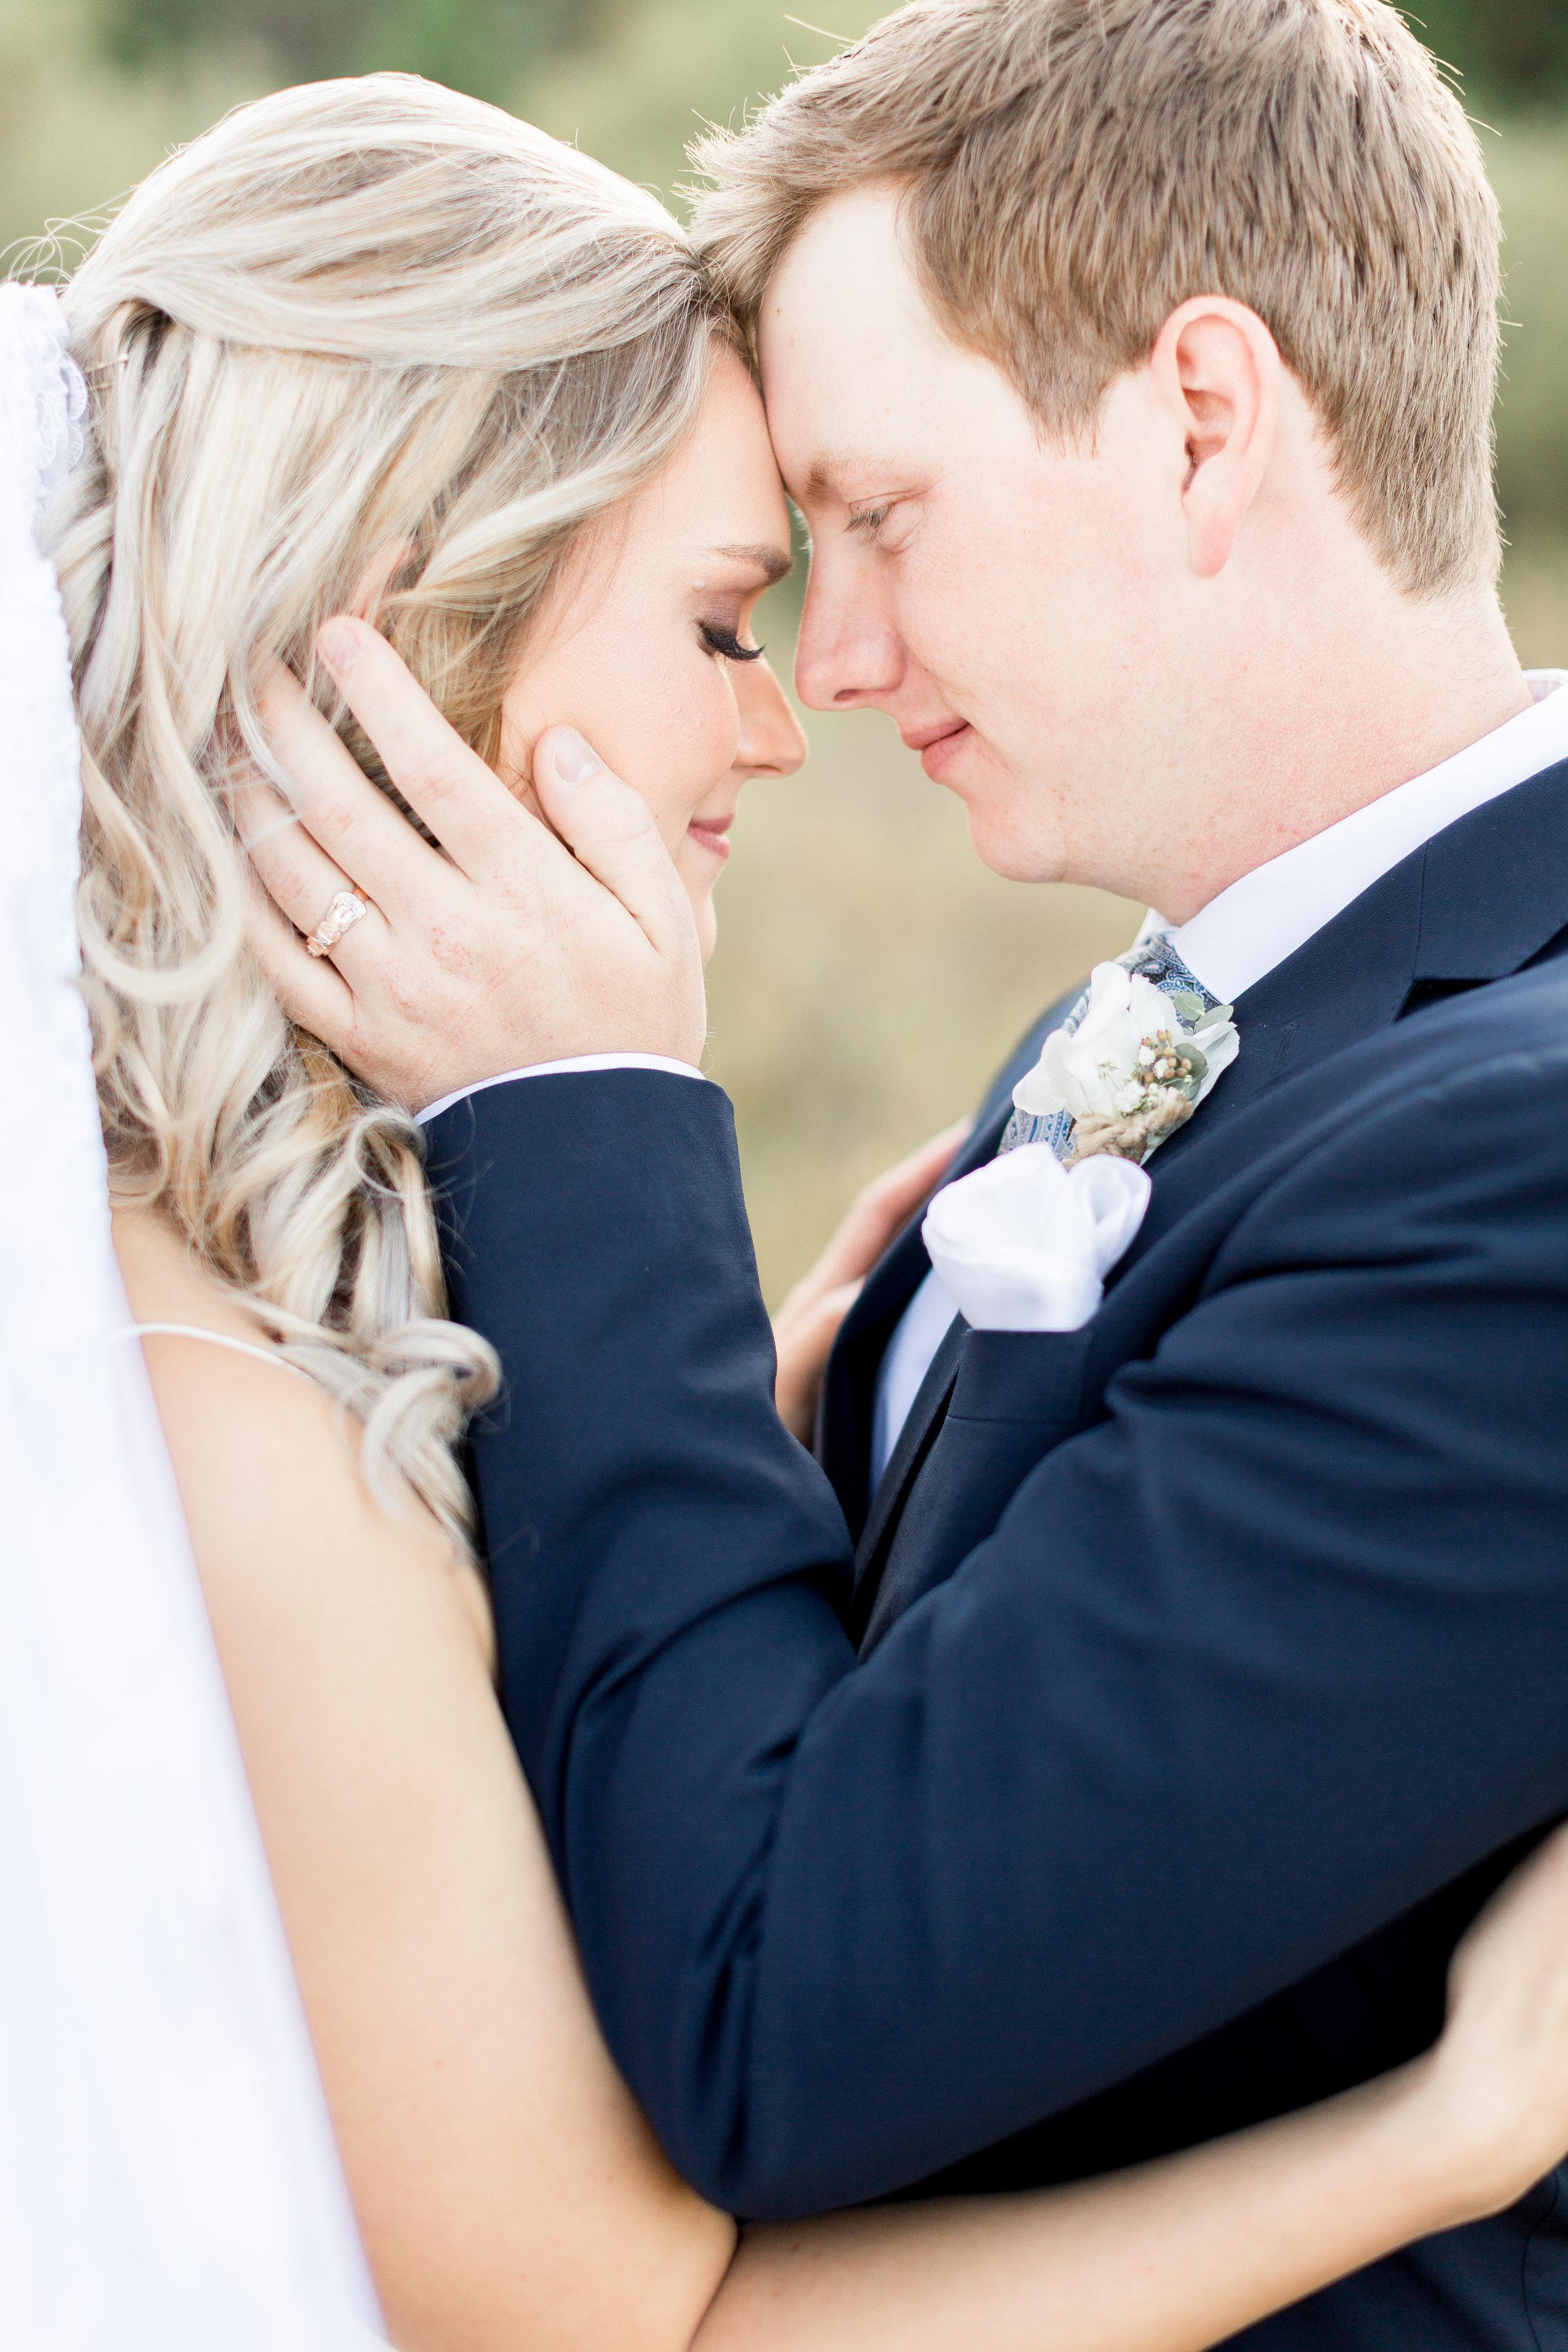 Destination-luxury-wedding-sunset-photos-with-bride-and-groom (1 of)-2.jpg